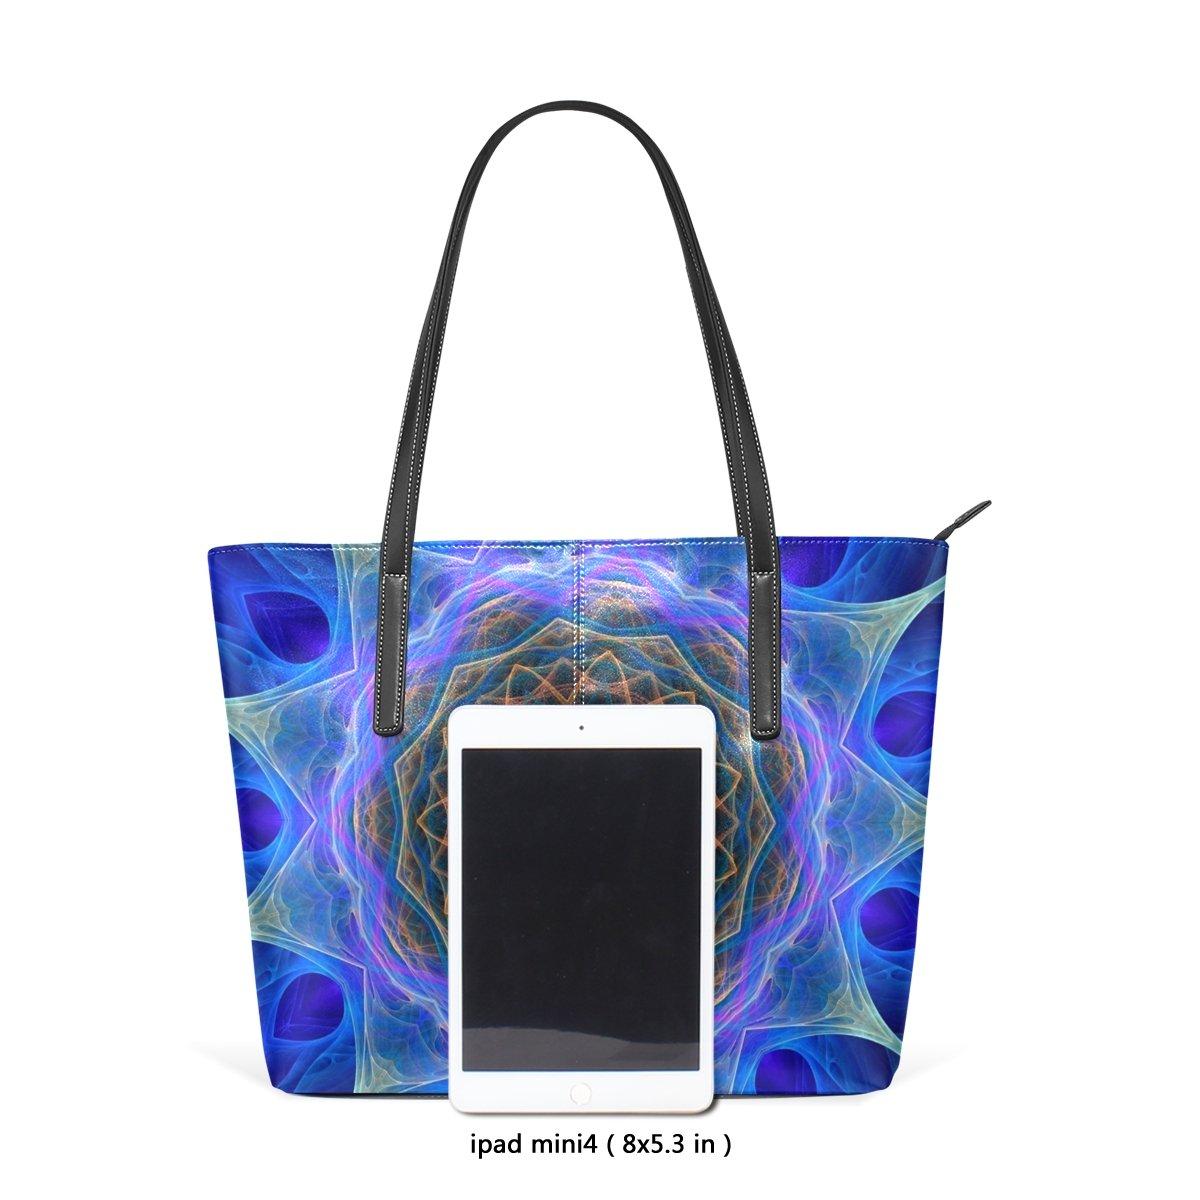 Cosmic Flower Leather Top Handle Satchel Girl Handbag Shoulder Tote Bag for Girls Women